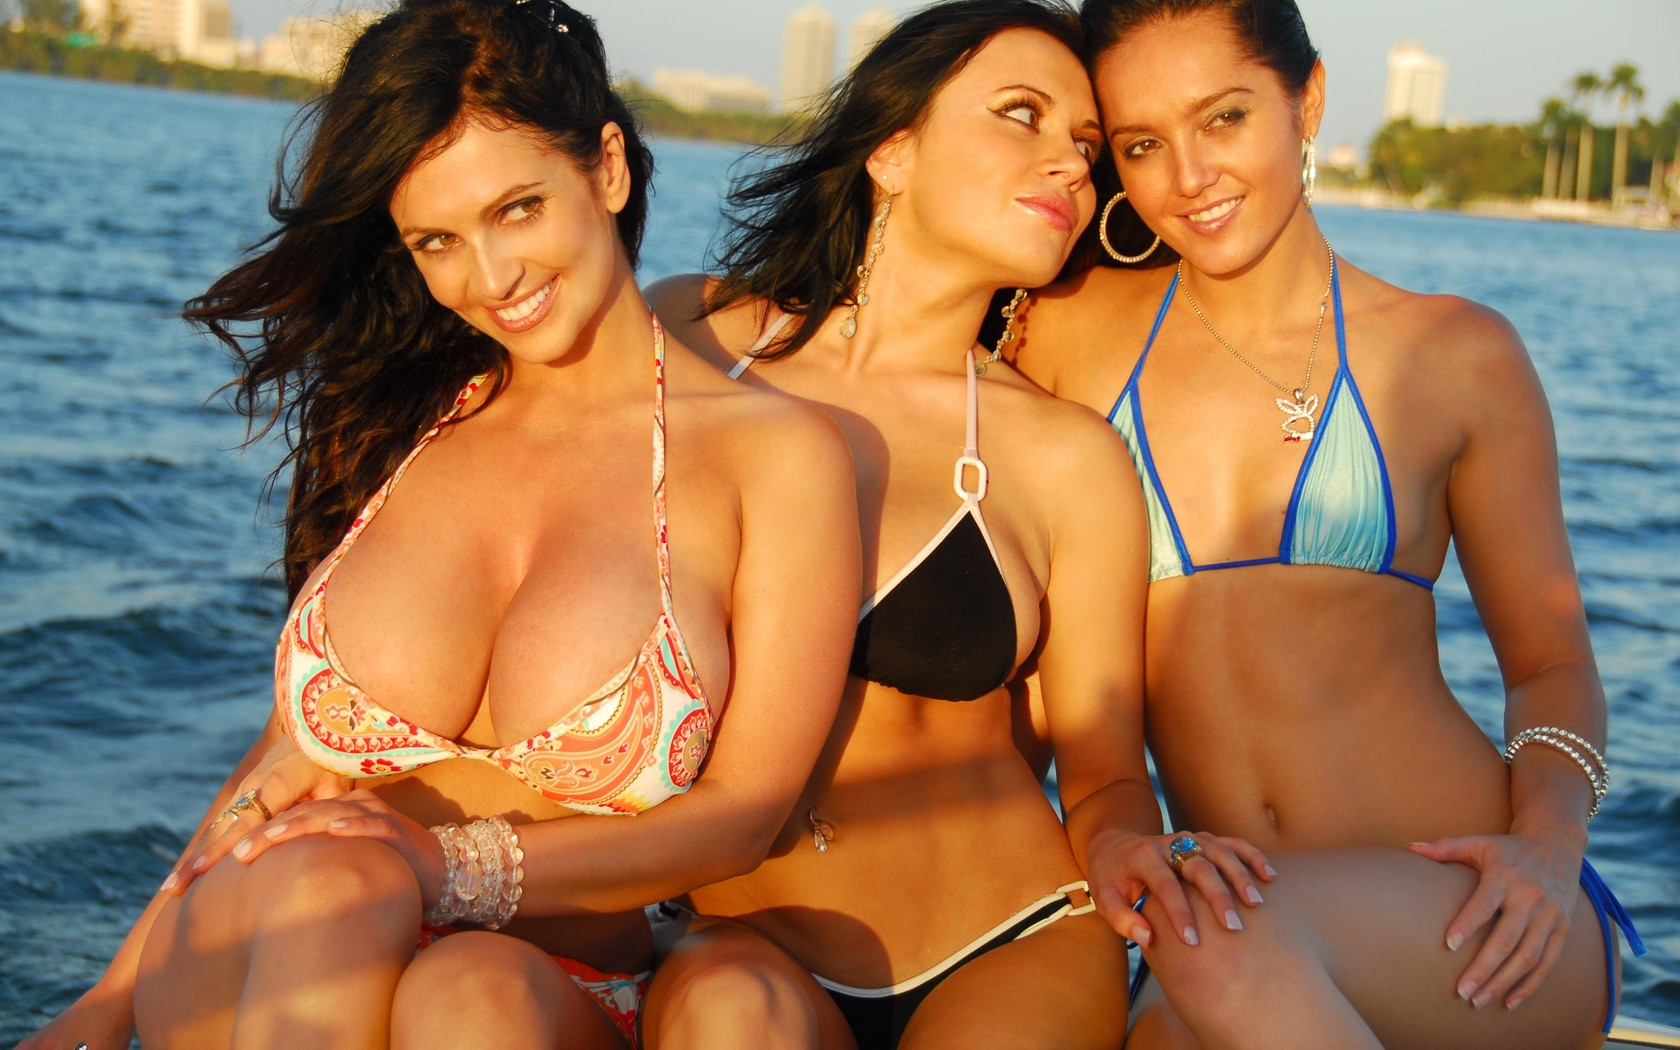 422430_zakat_zagar_ulybka_bikini_4000x2768_(www.GdeFon.ru)